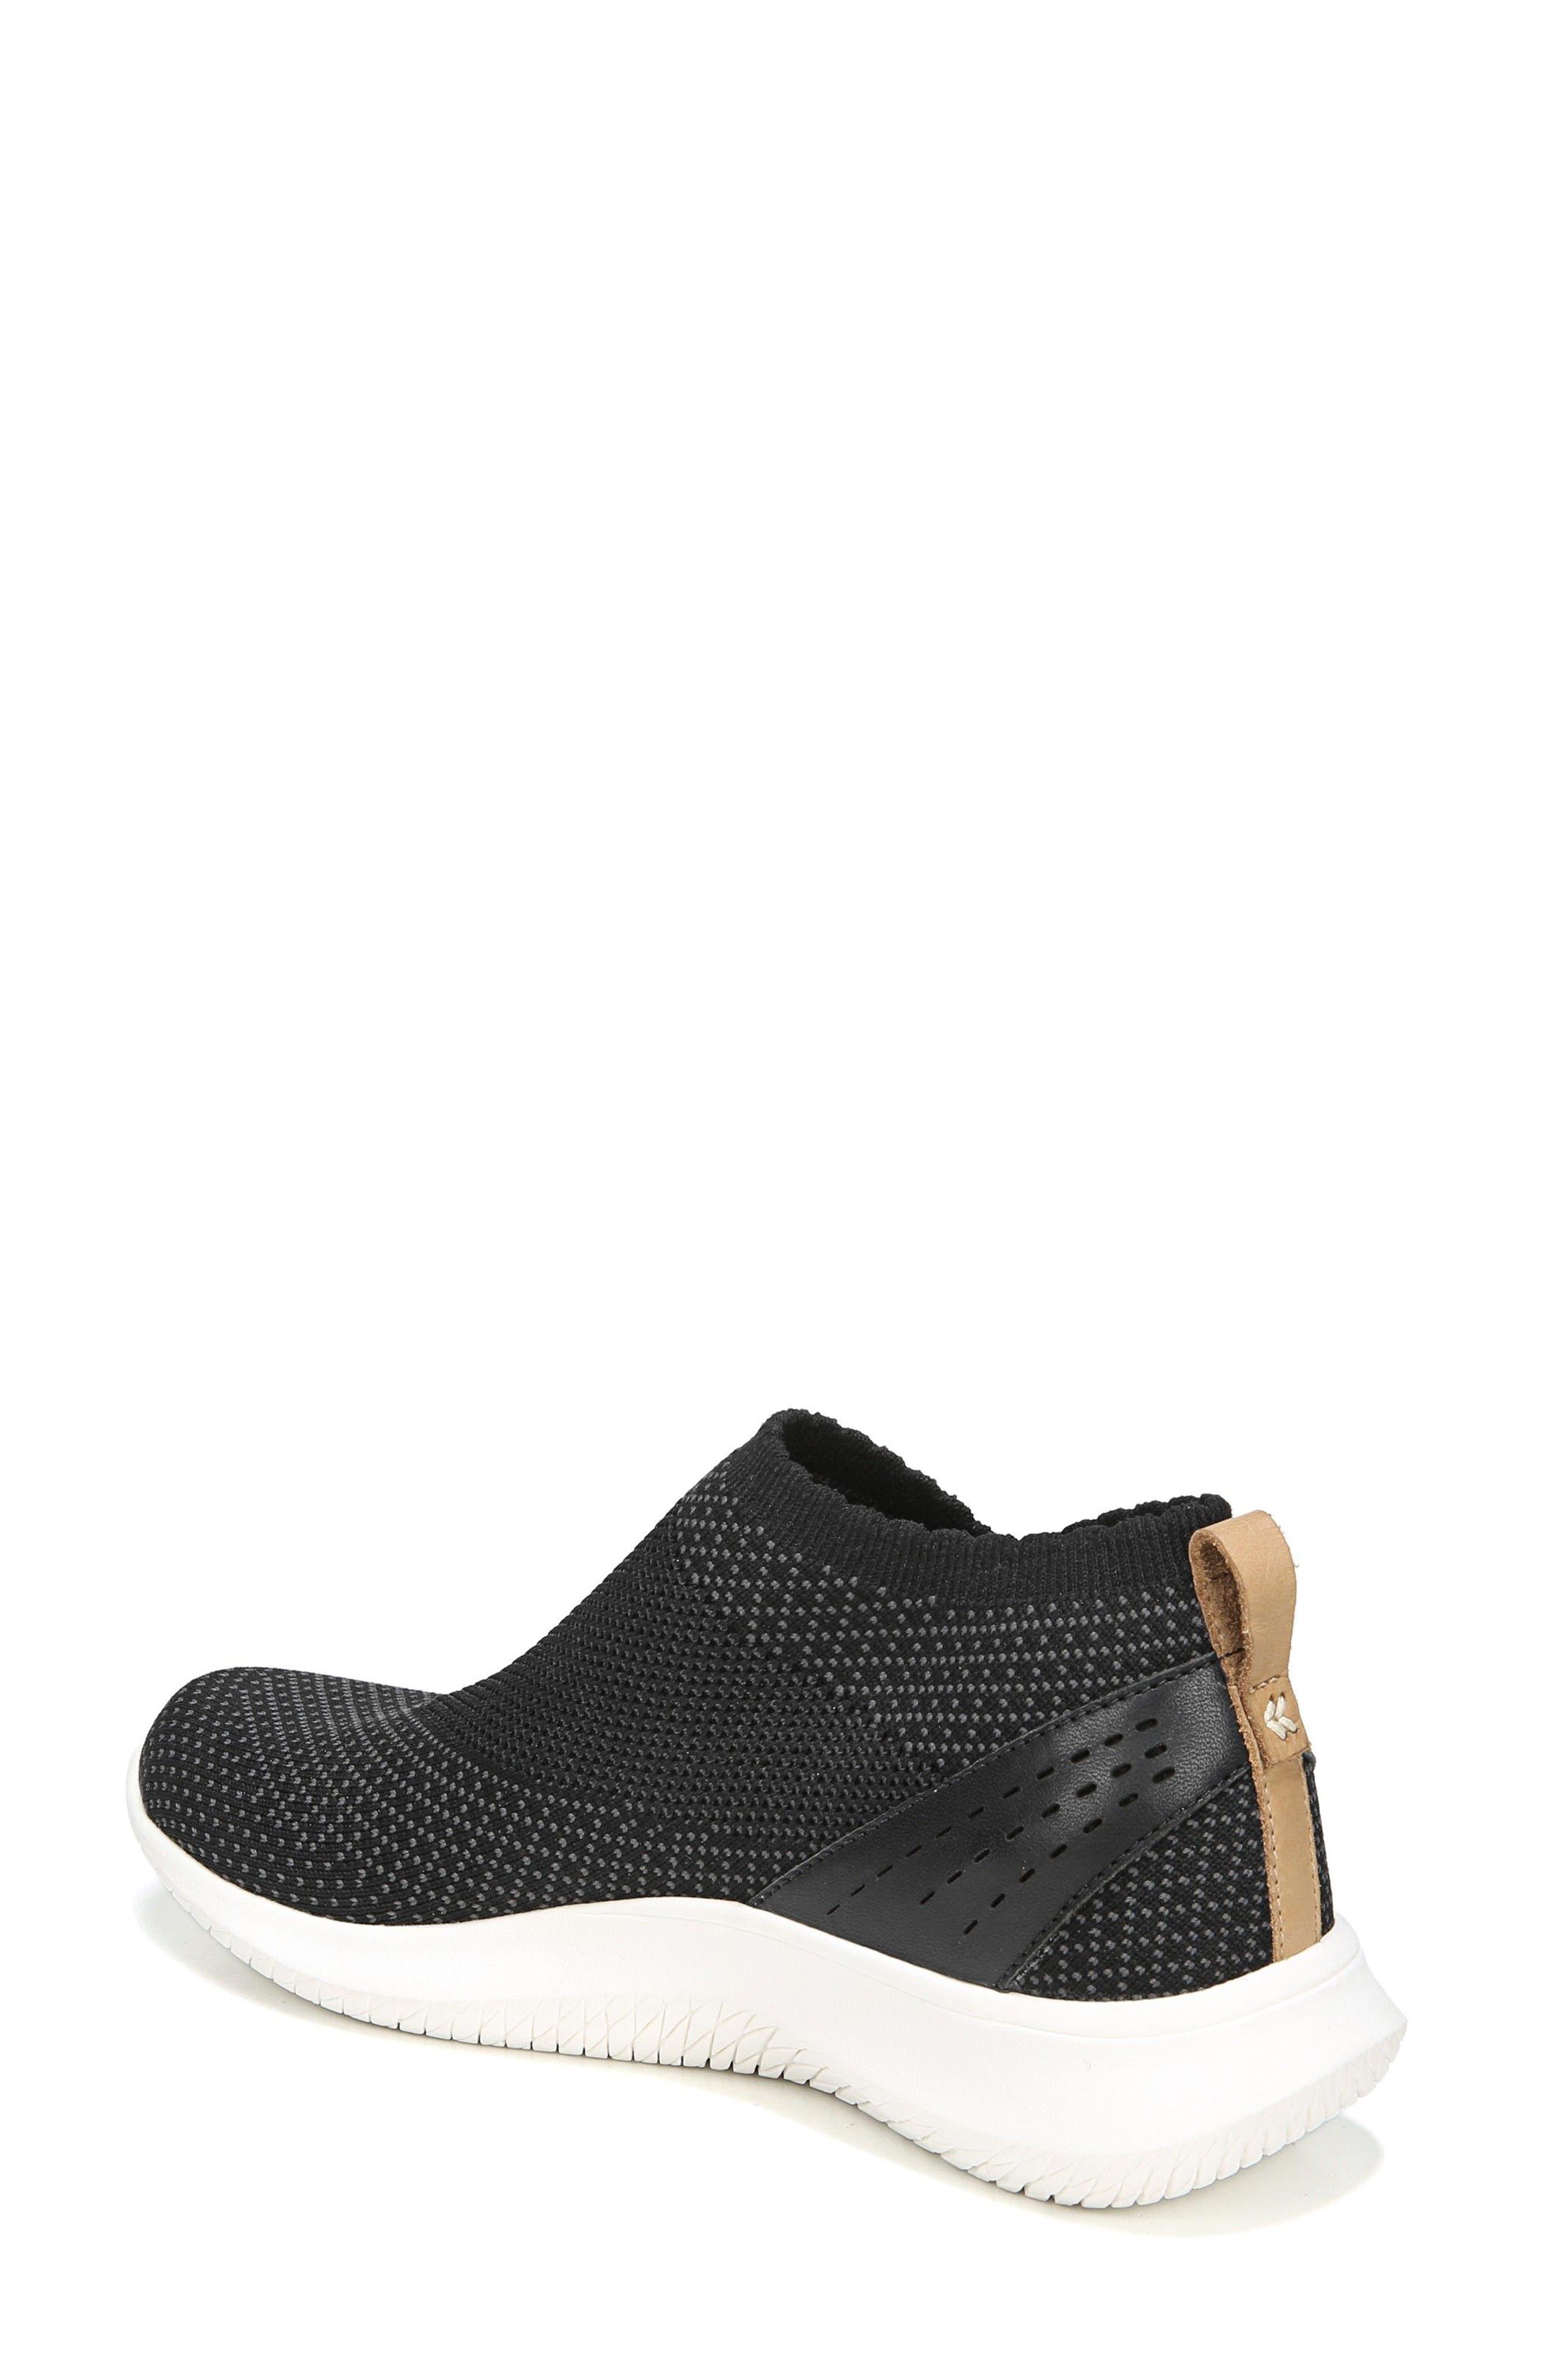 Fierce Knit Slip-On Sneaker,                             Alternate thumbnail 2, color,                             BLACK KNIT FABRIC